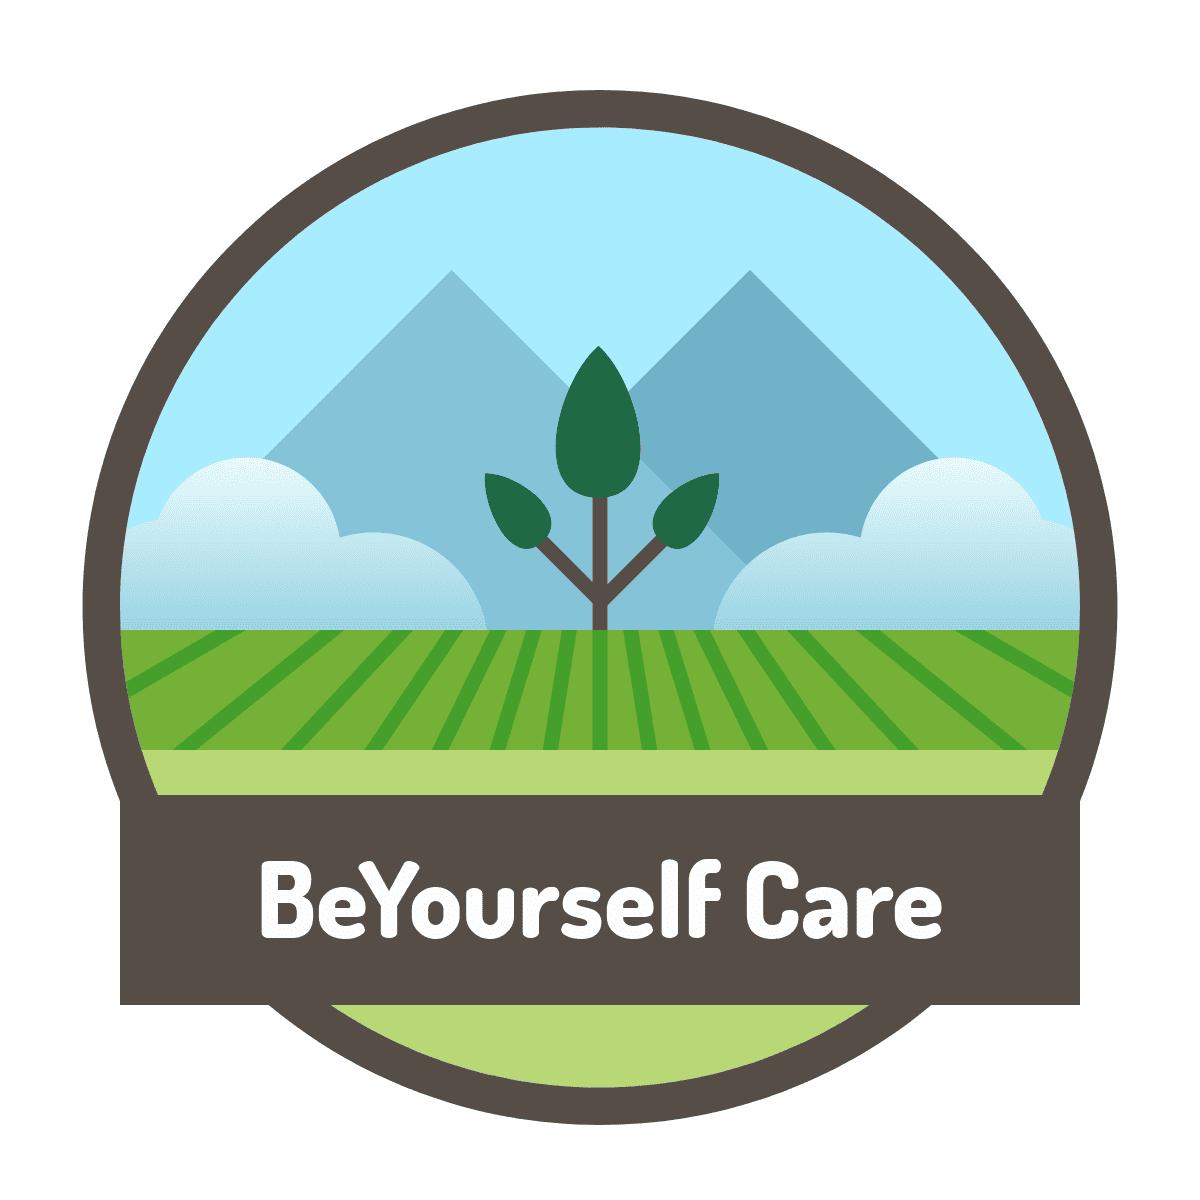 BeYourself Care